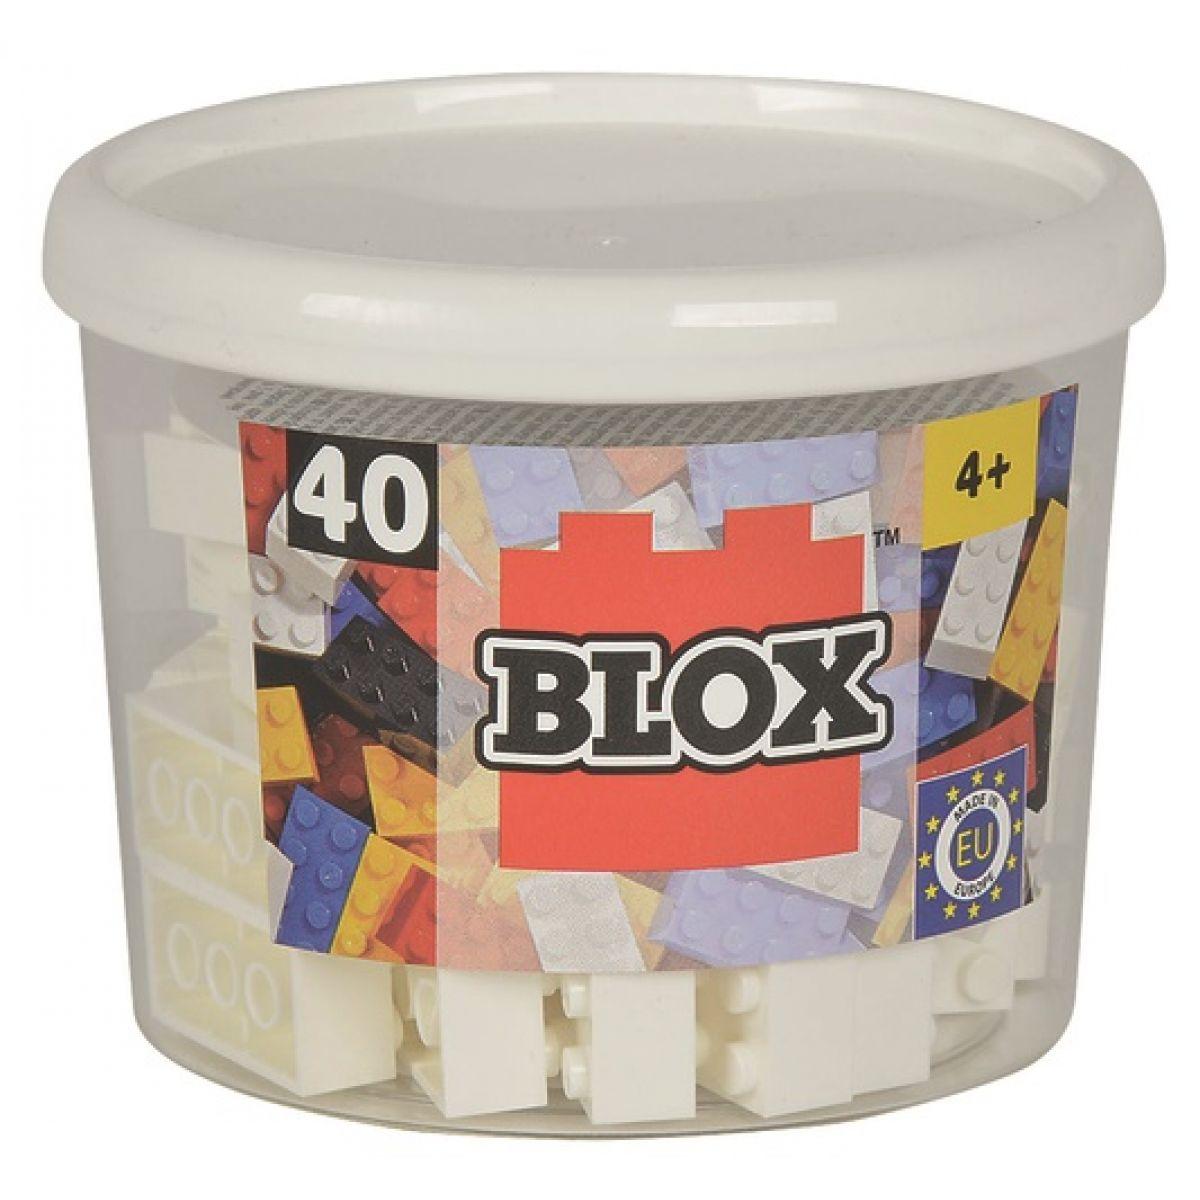 Blox 40 Kocky biele